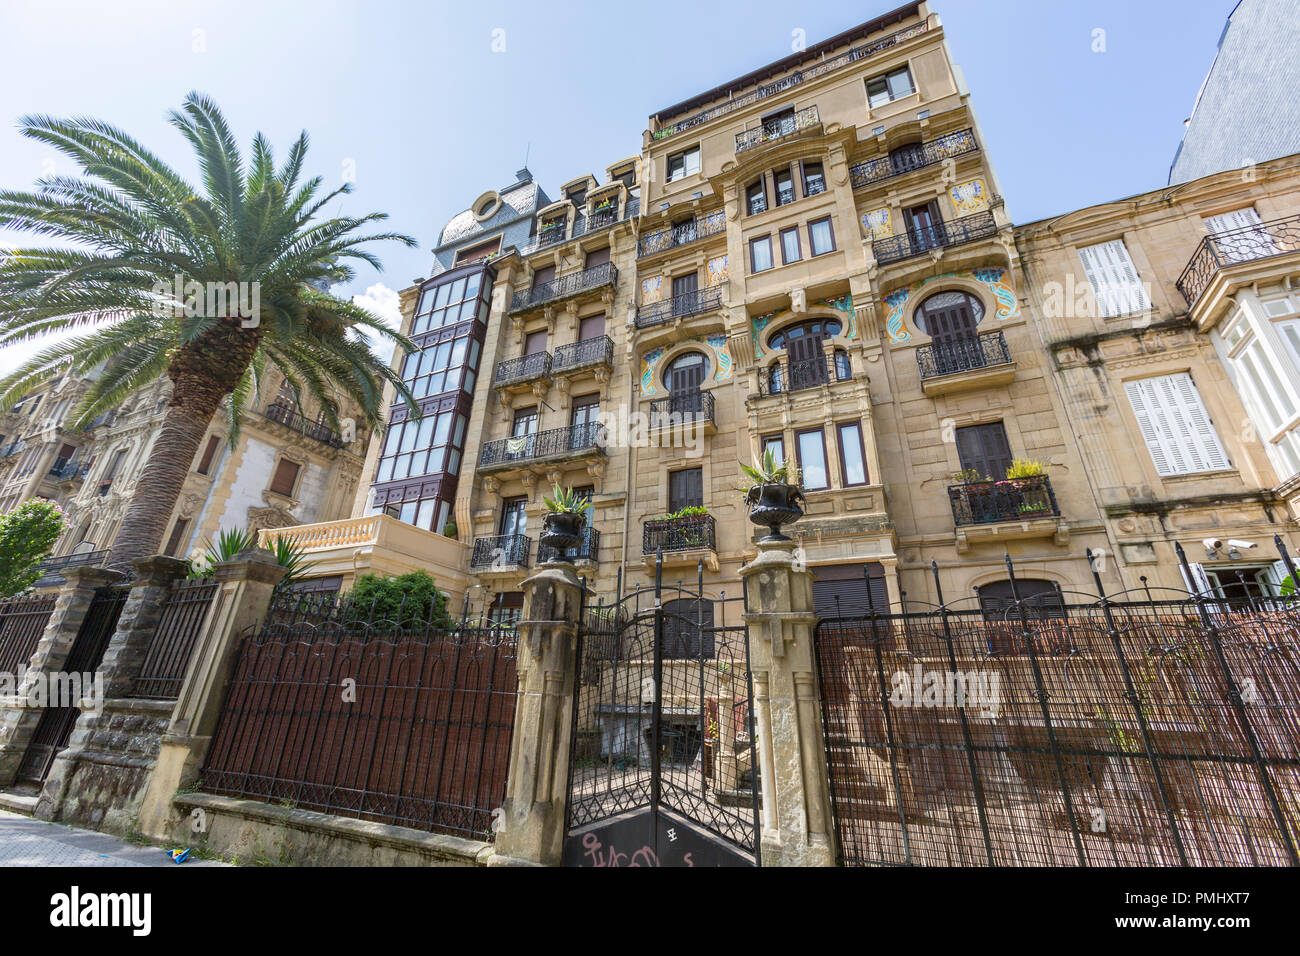 Apartments buildings in Gernikako Arbola Pasealekua, San Sebastian, Donostia, Basque Country, Spain - Stock Image